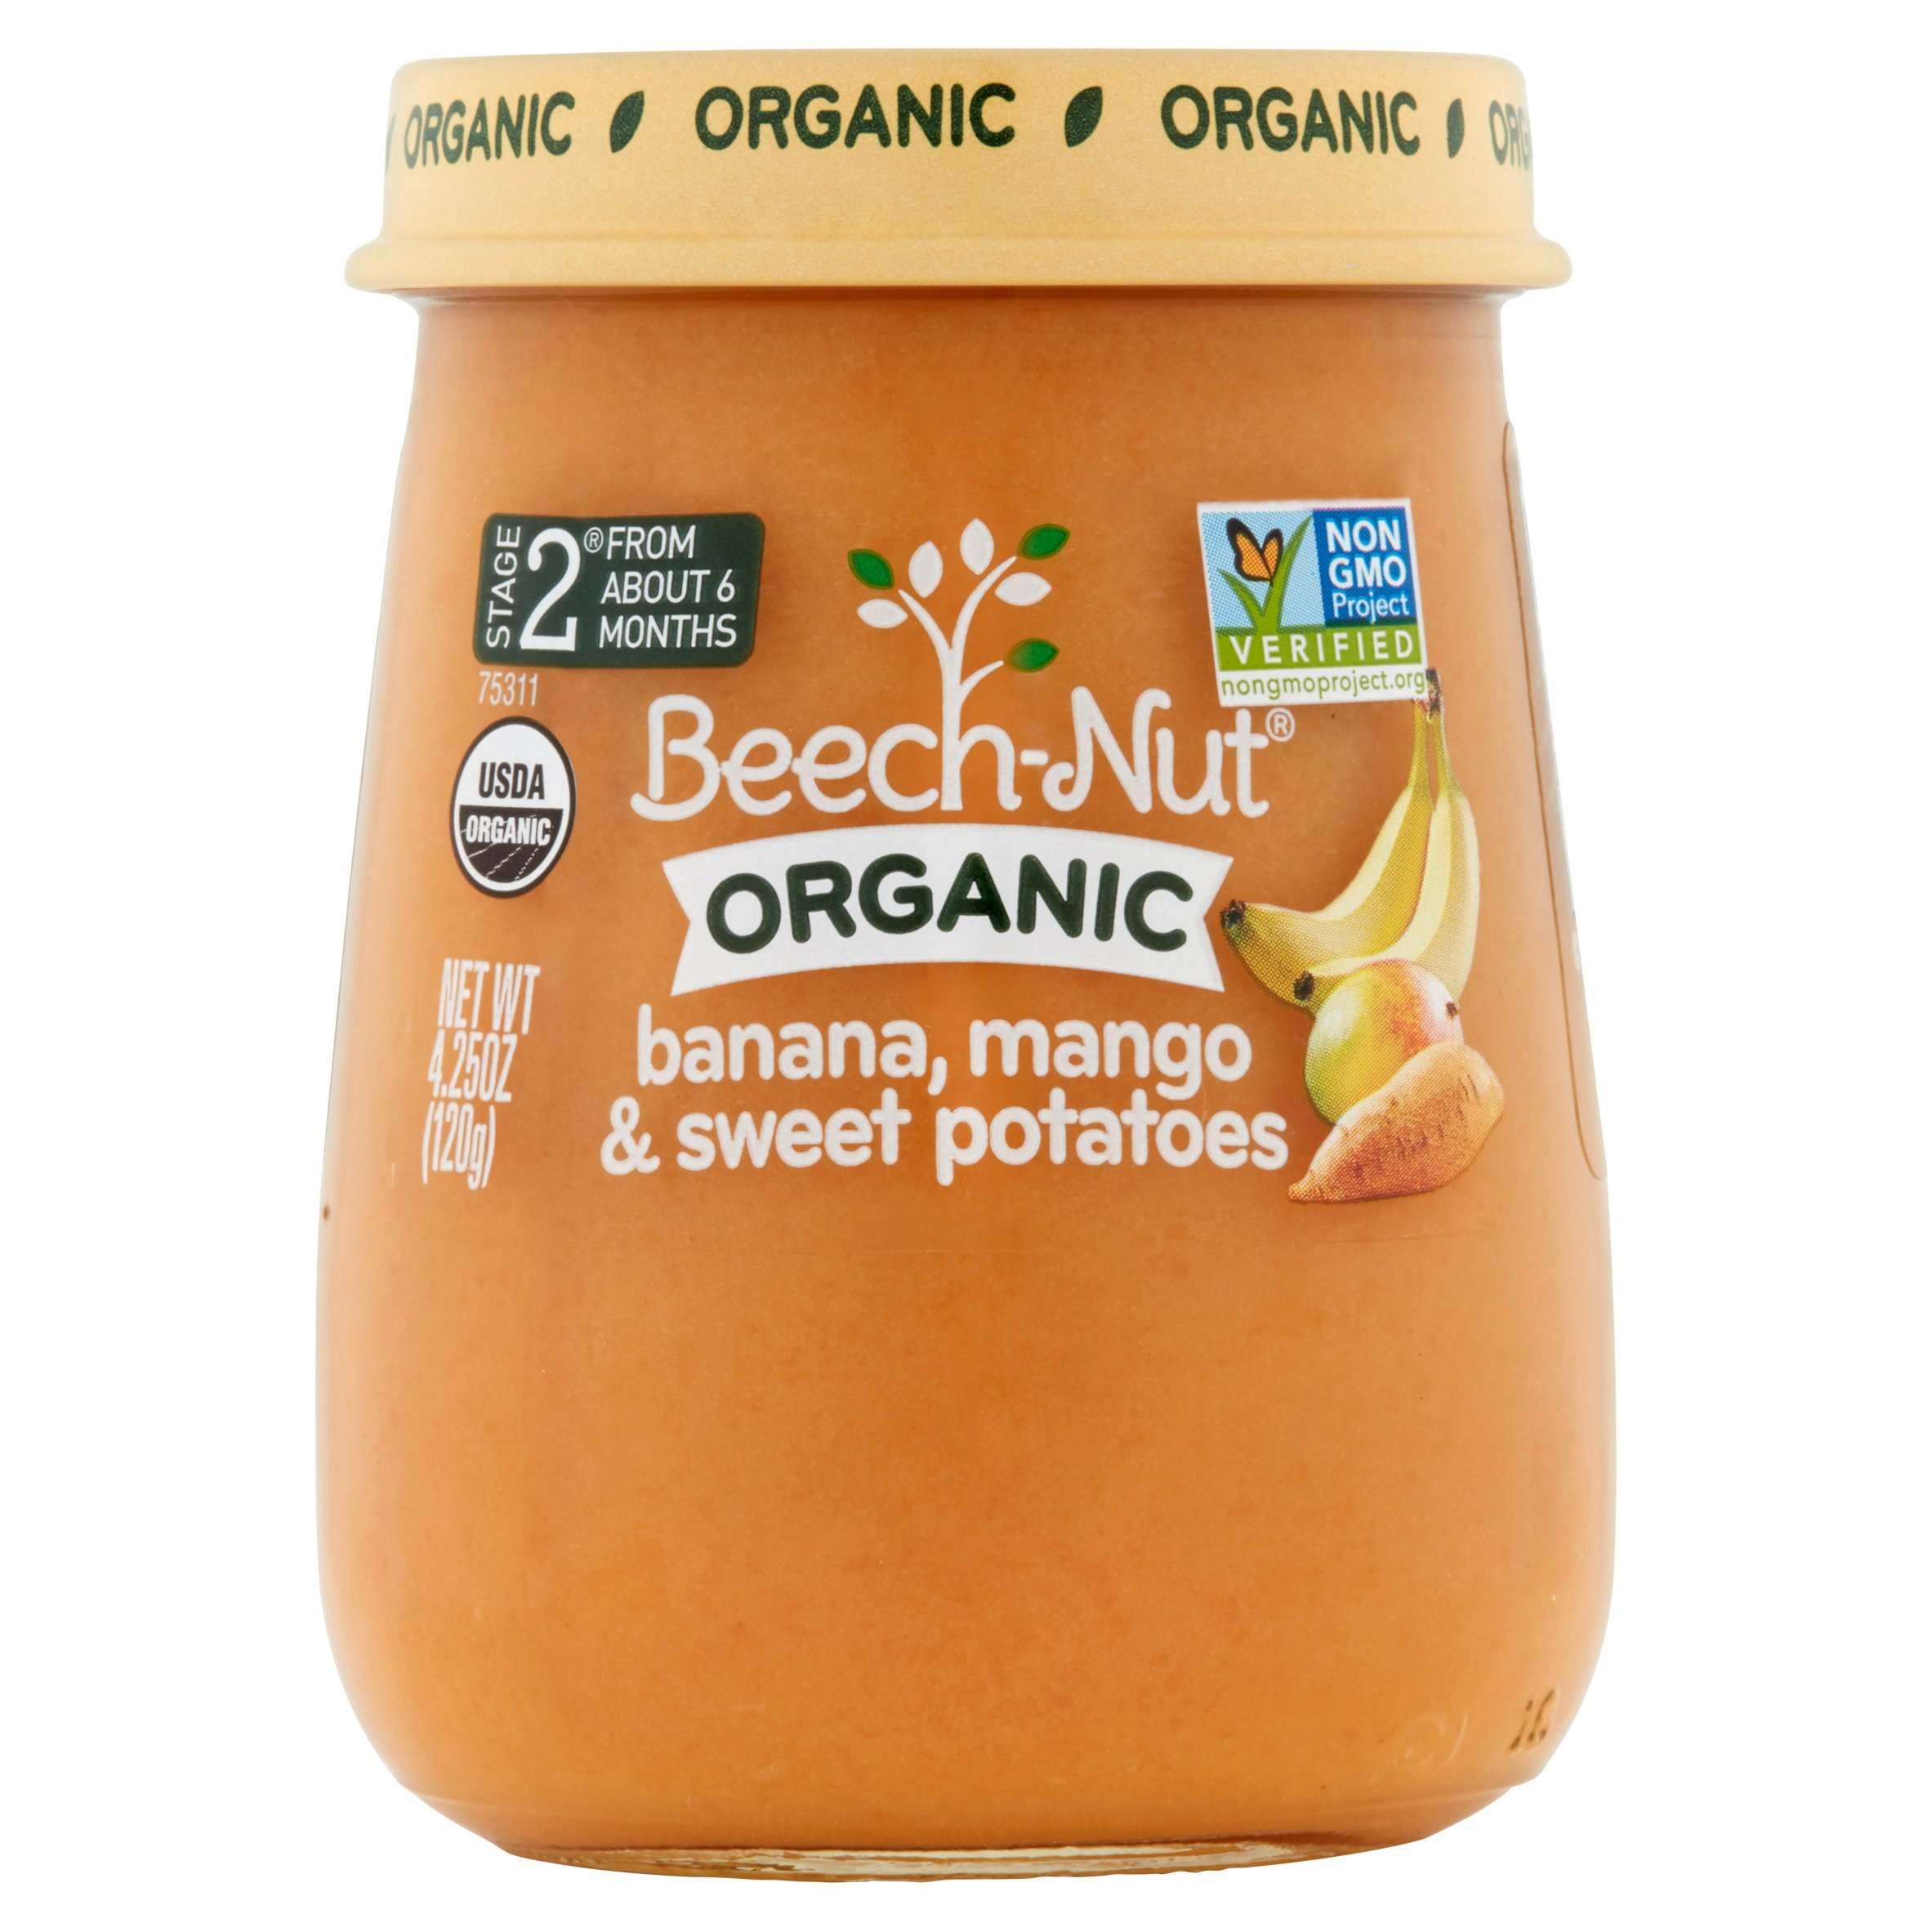 Beech-Nut Organic Stage 2 Banana, Mango & Sweet Potatoes,4.25oz, (Pack of 10)